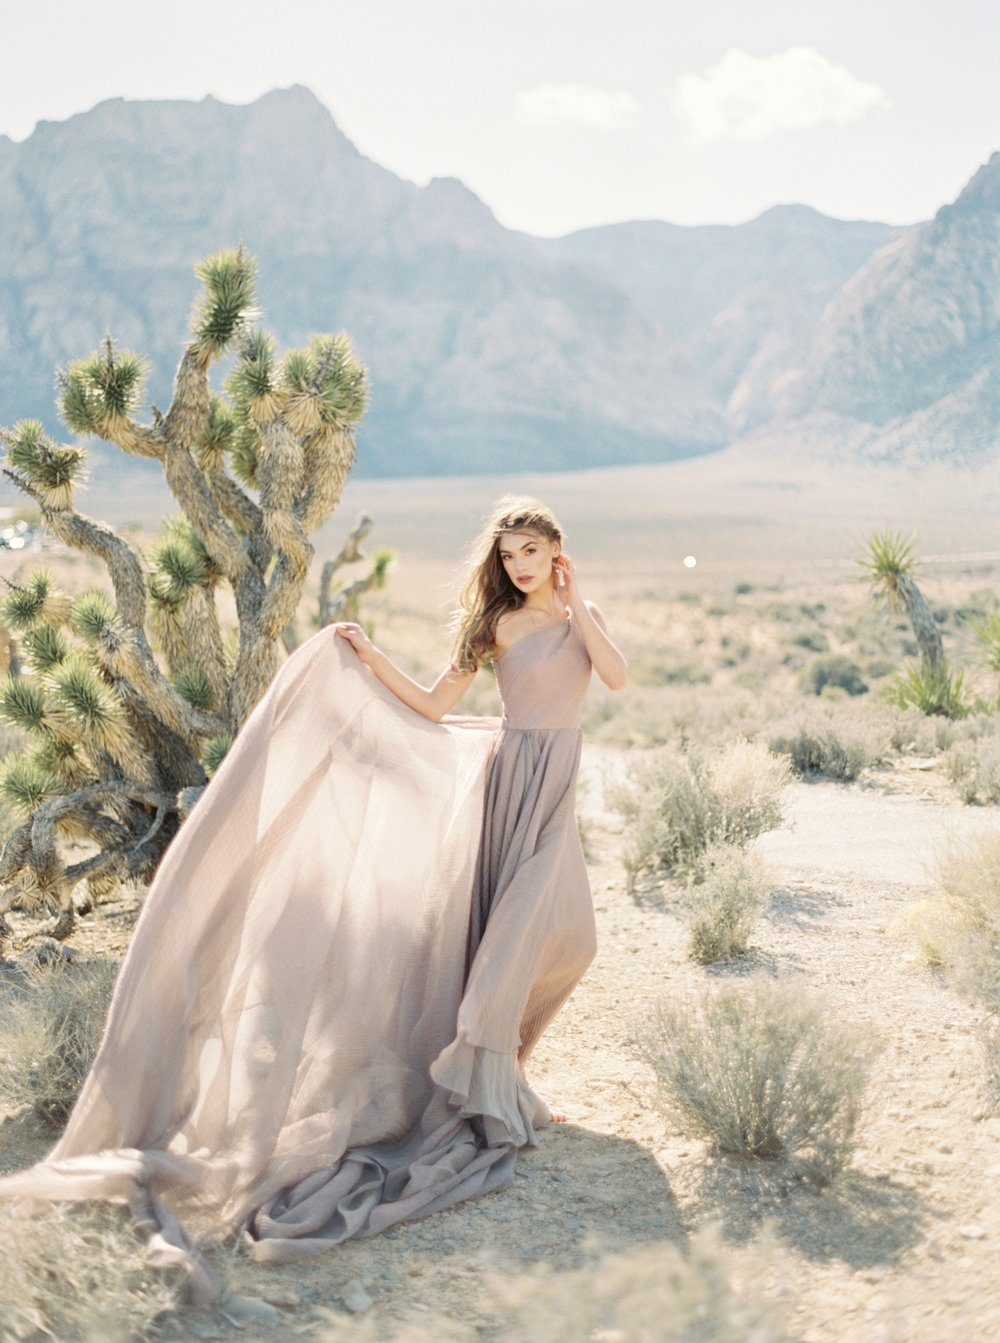 Fine Art Bridals. Las Vegas. Whitneykrenek.com